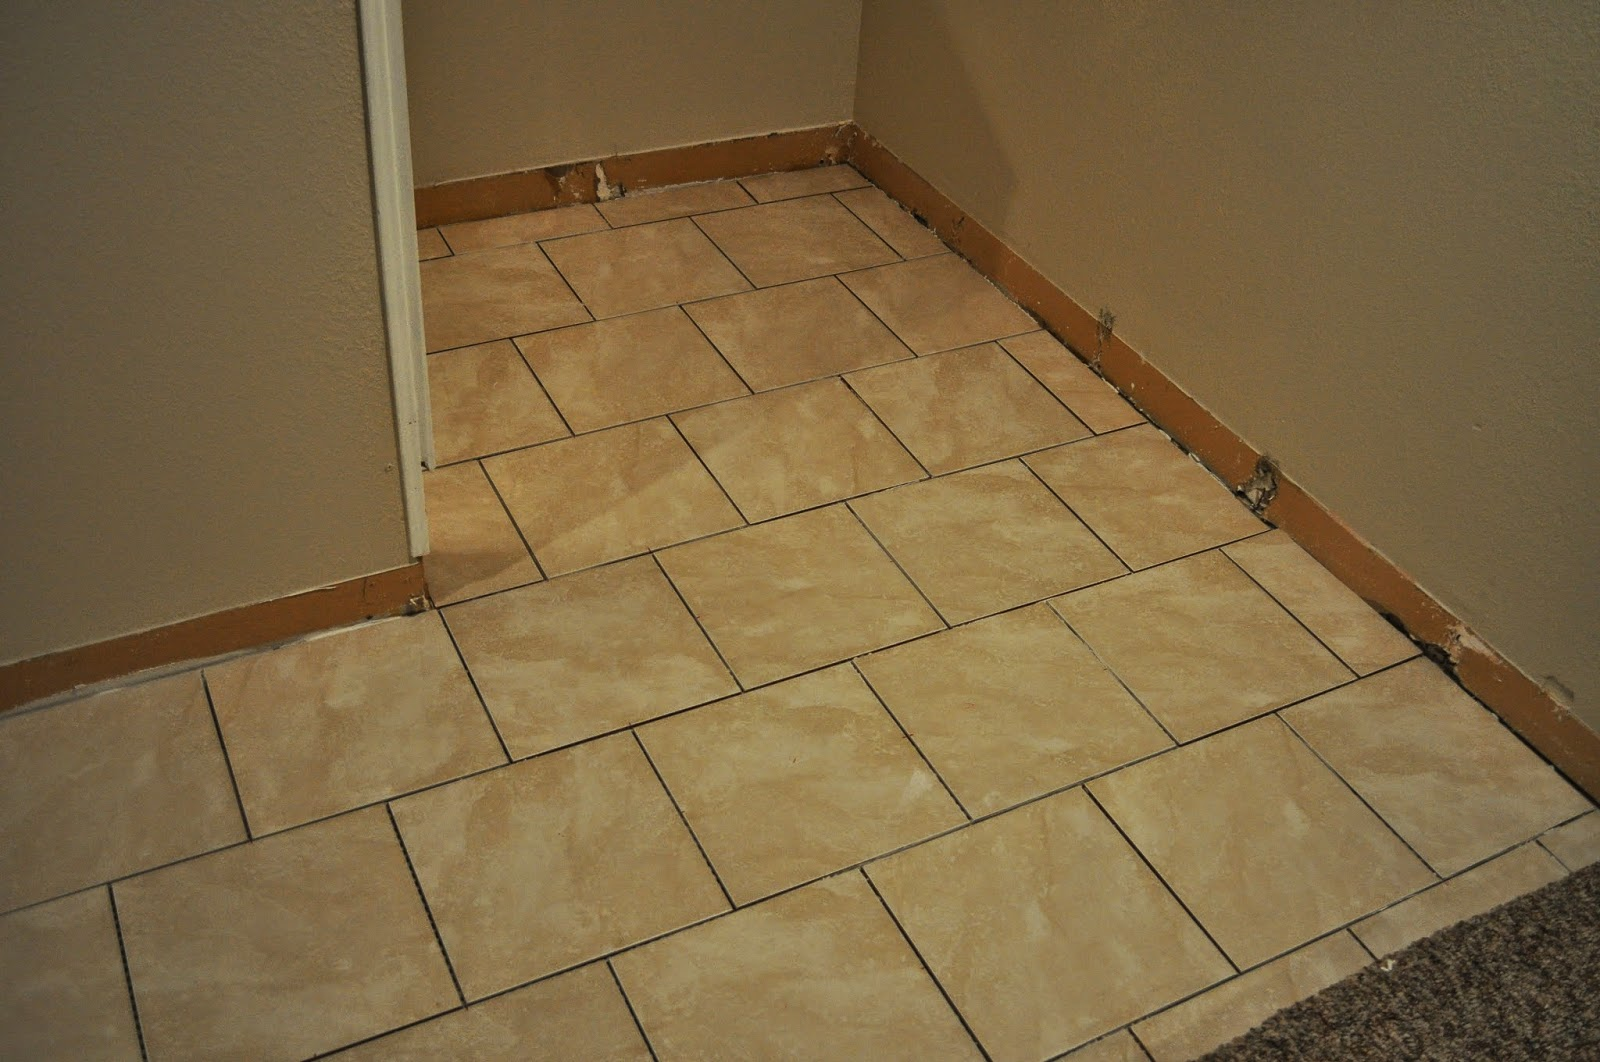 innovatile, accucolor, grout, light smoke grout, premium sanded grout, menards, tiling, tile, basement, project, diy, basement floor project, project